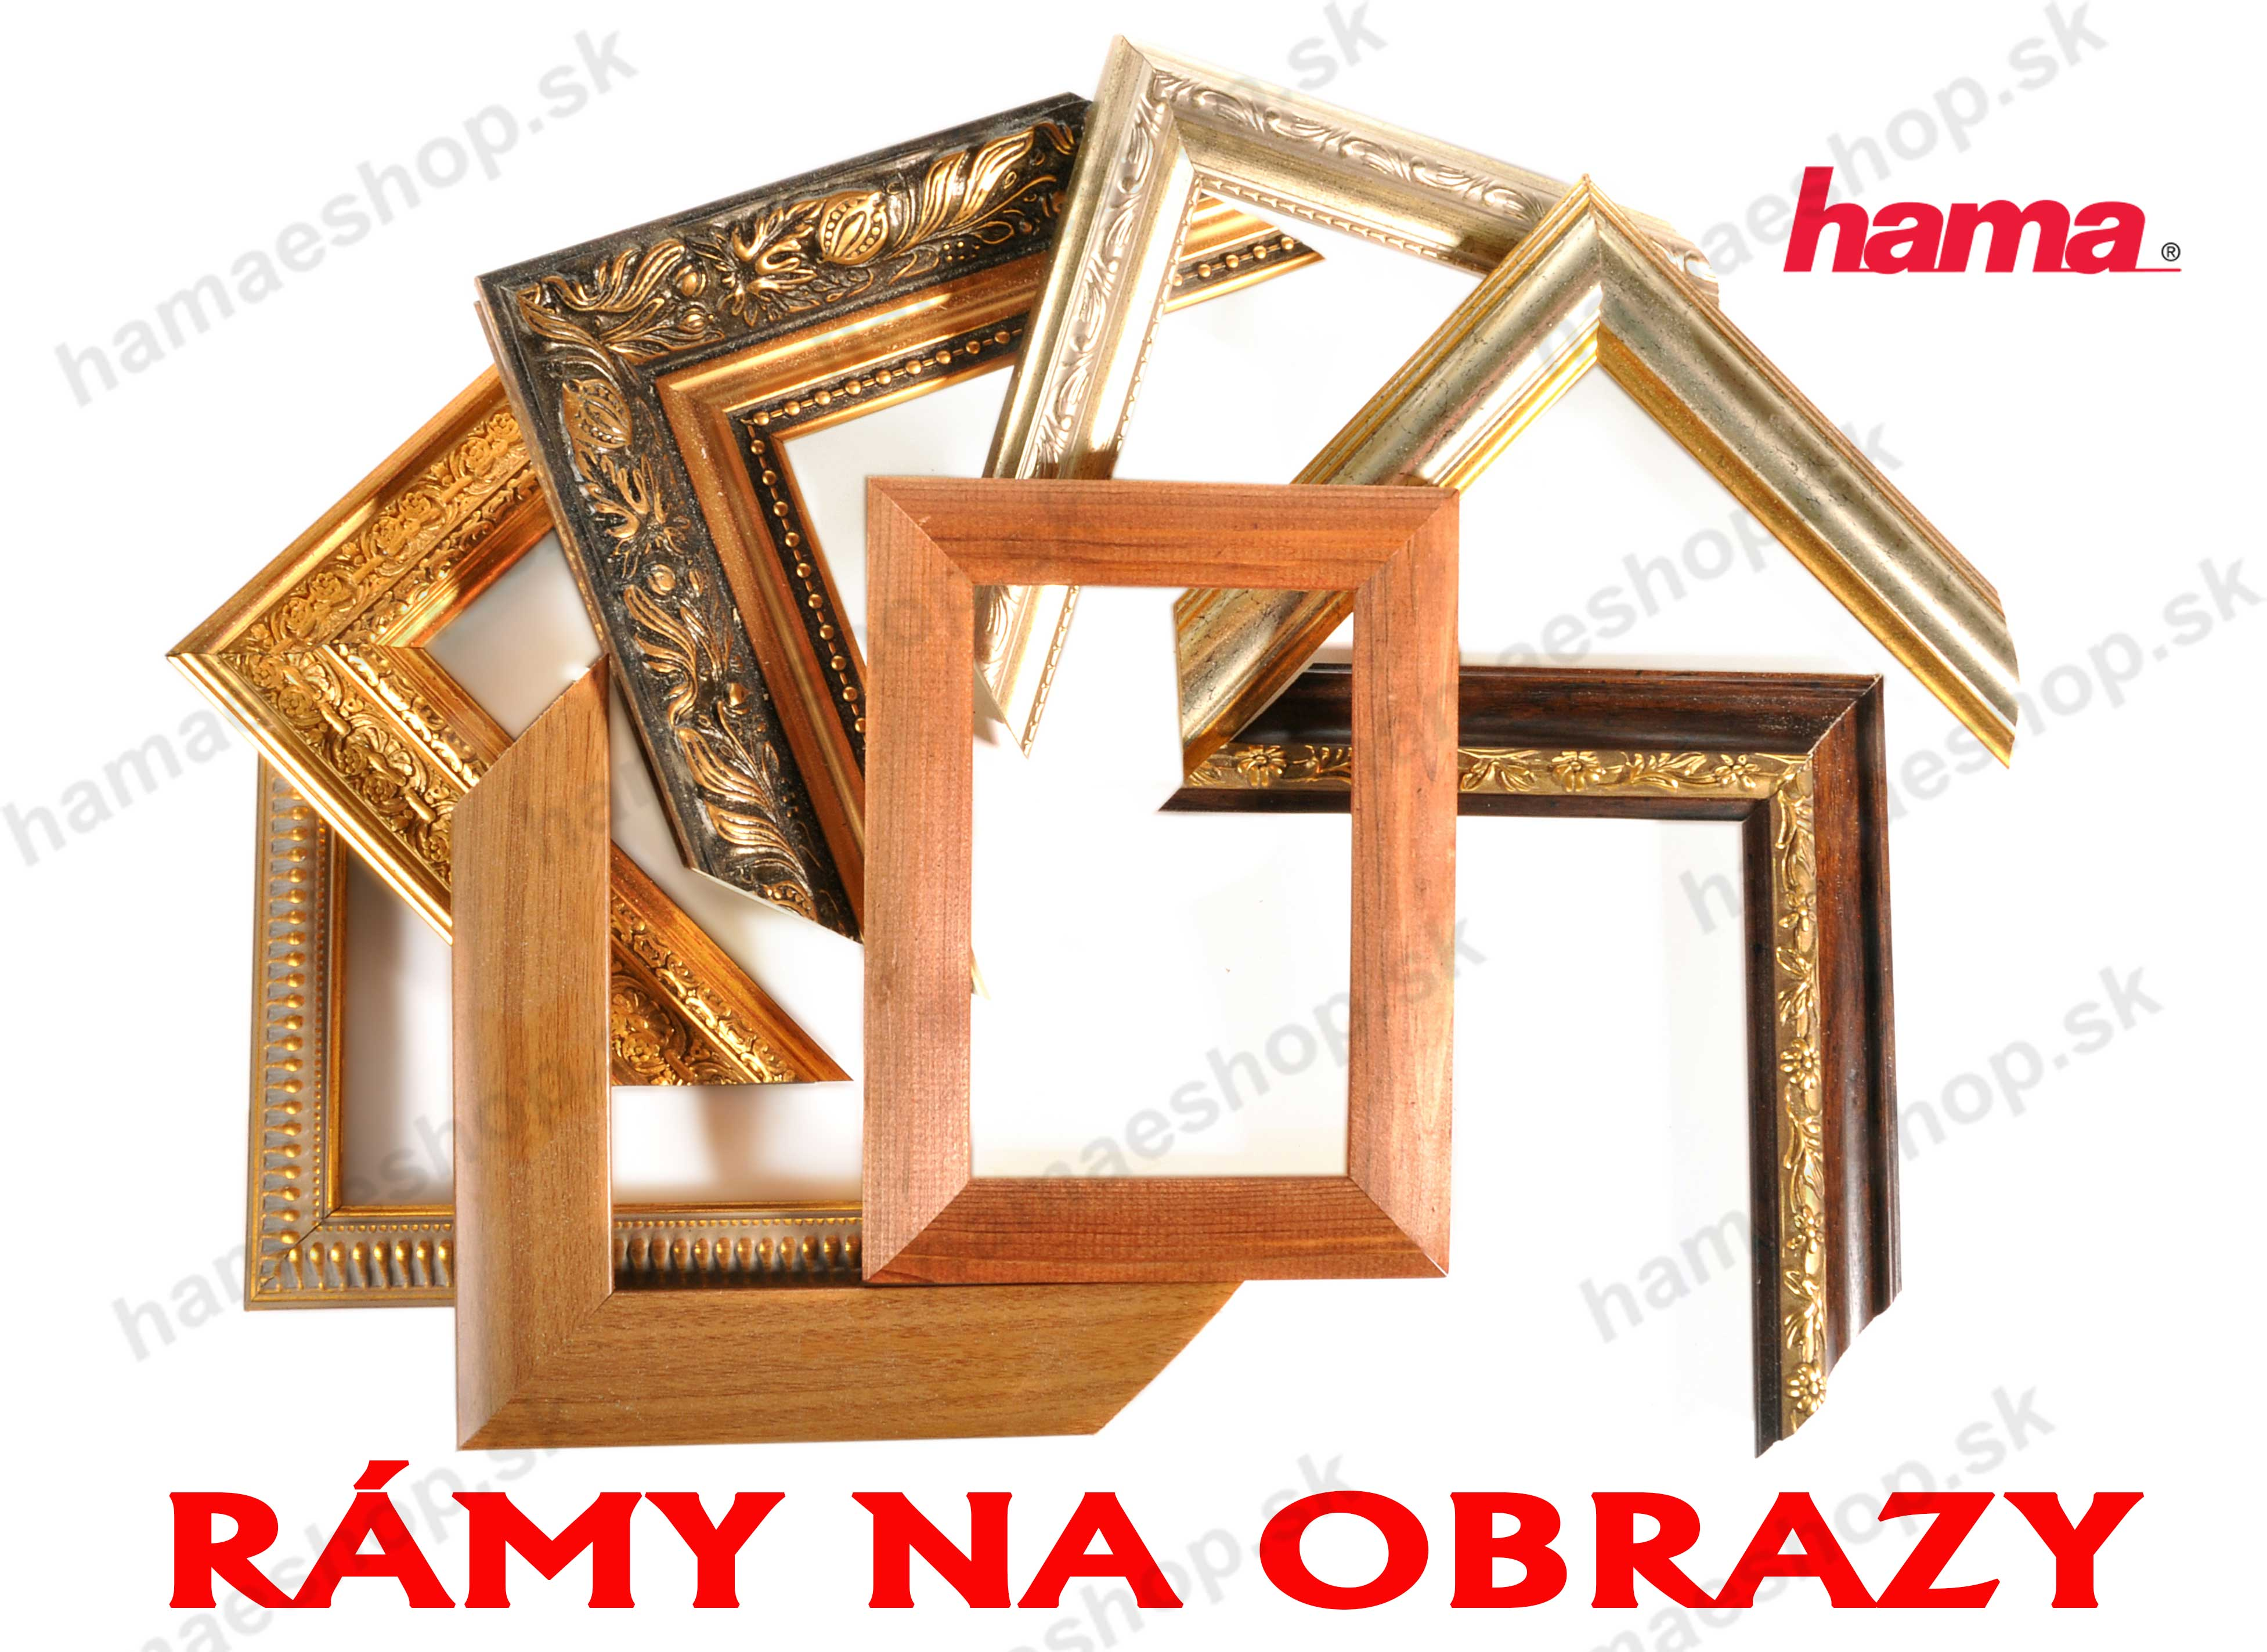 5cd2a670f Rámy na obrazy | HamaEshop.sk